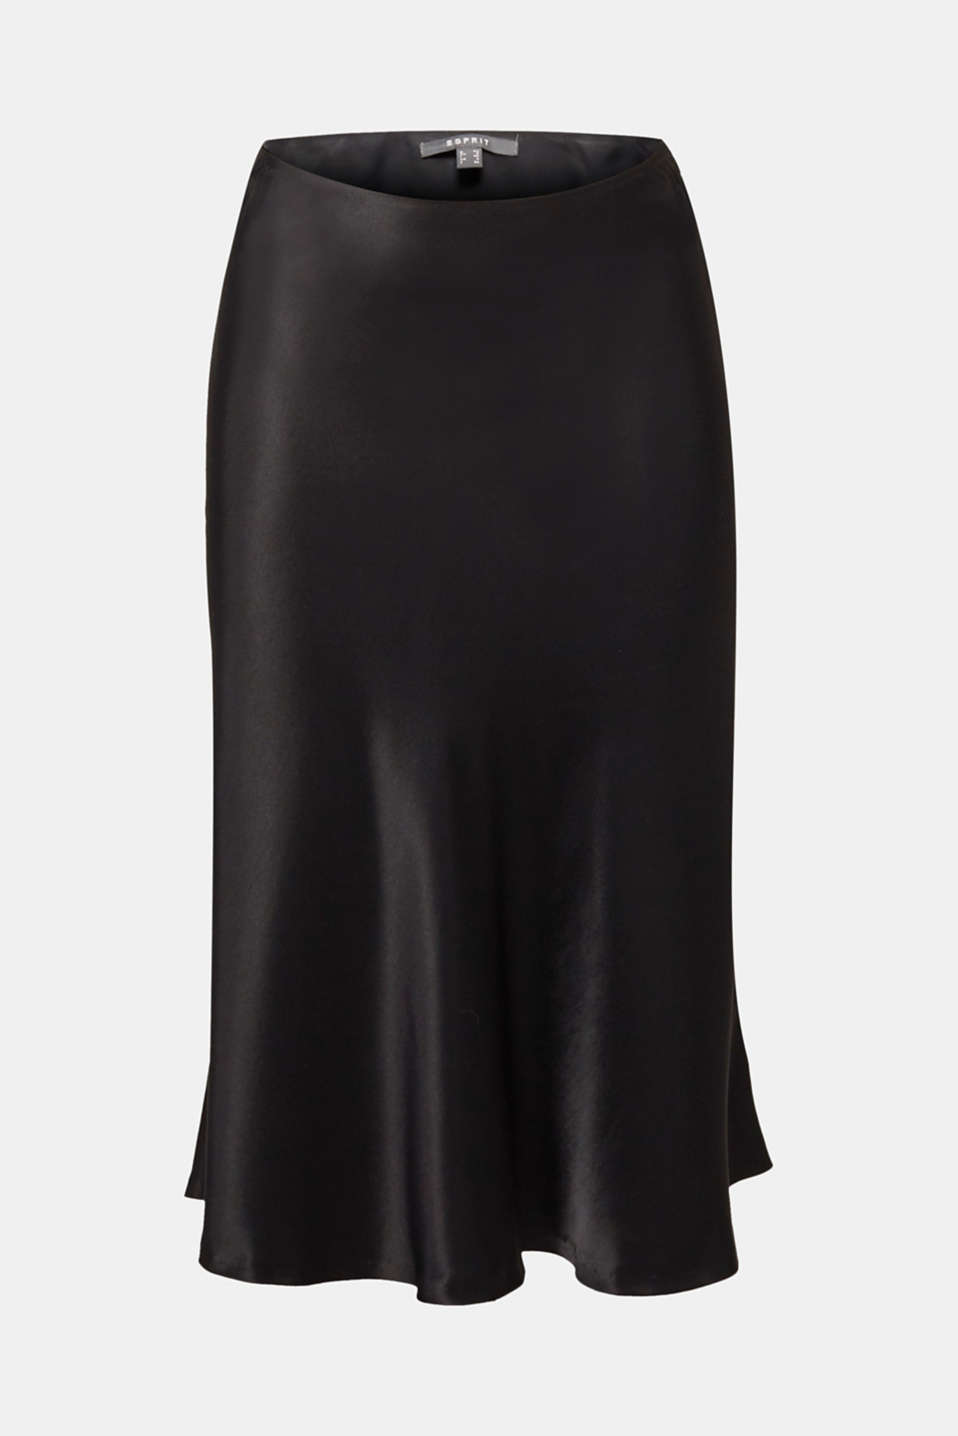 Flared midi skirt in satin, BLACK, detail image number 6